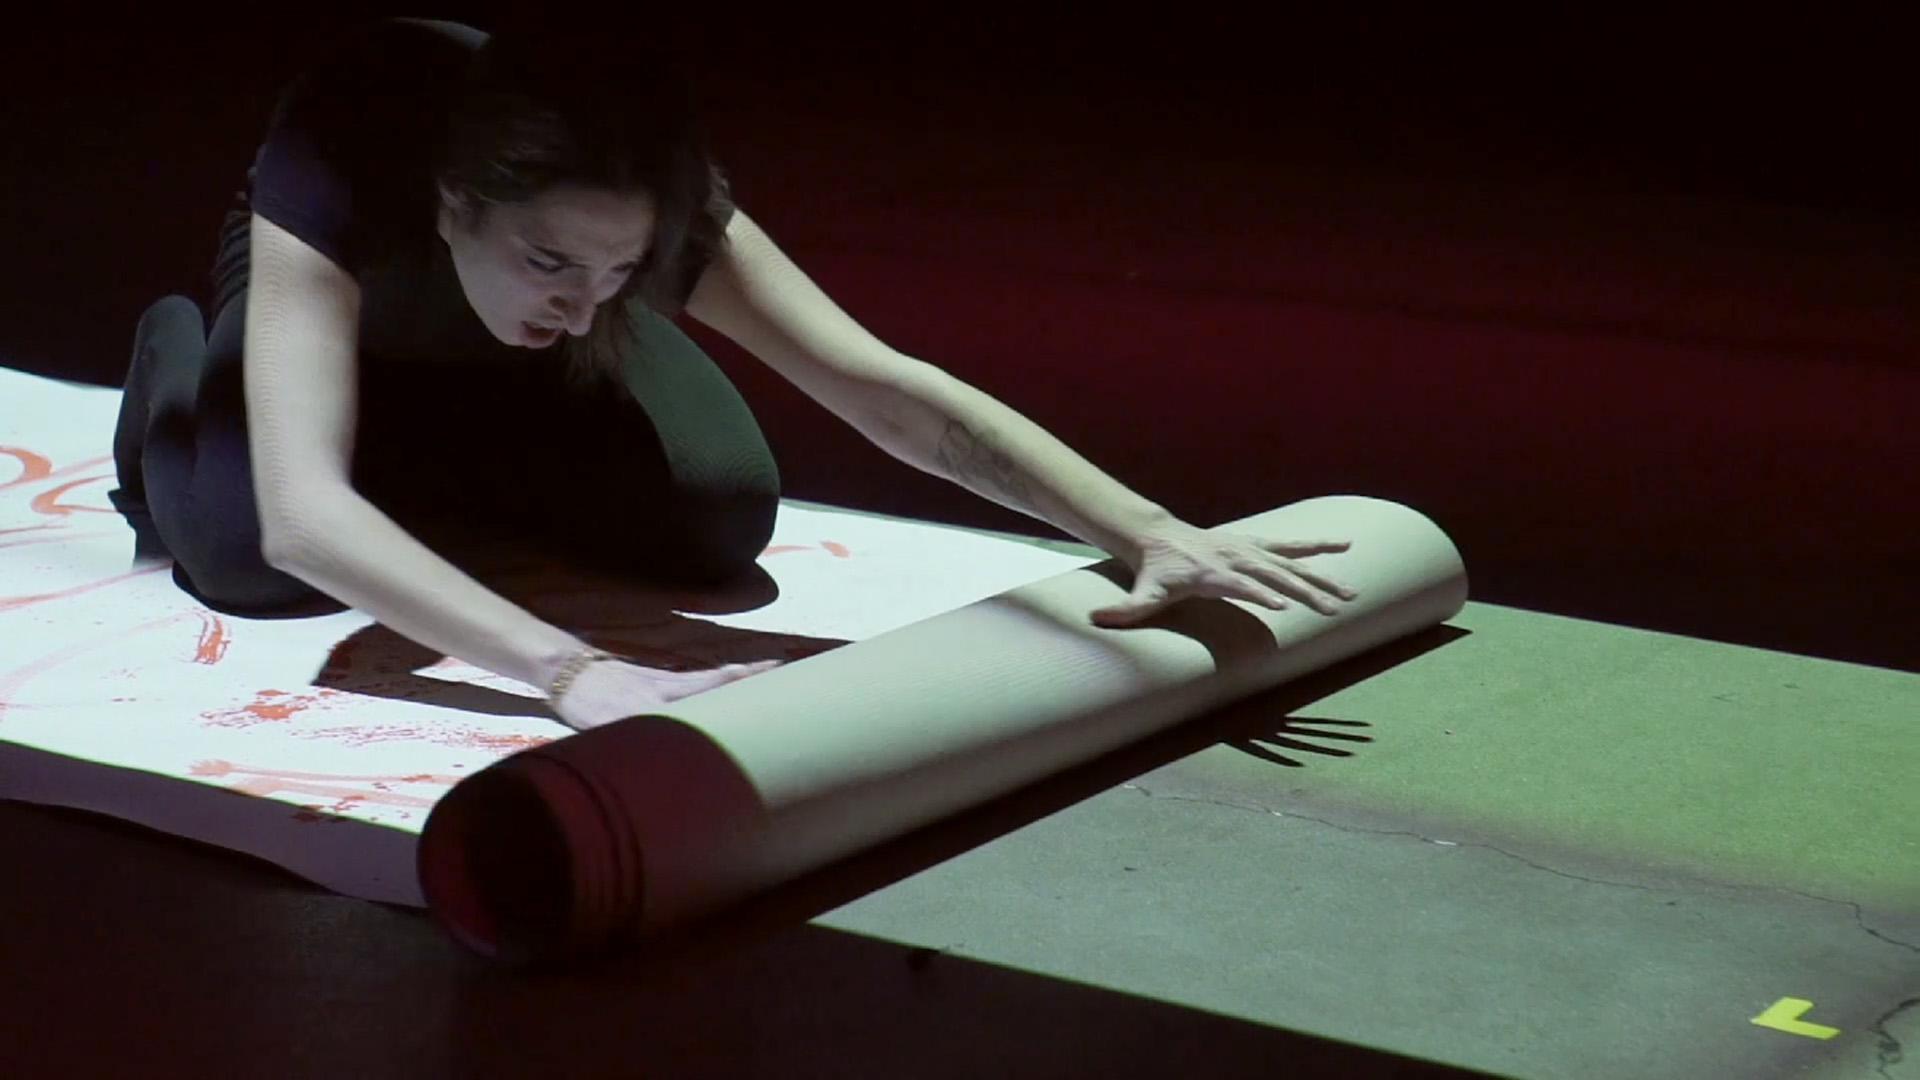 2017 17_Periferika Performing Art Place_17_lapressionedelrosso_frame5_Francesca Pignanelli